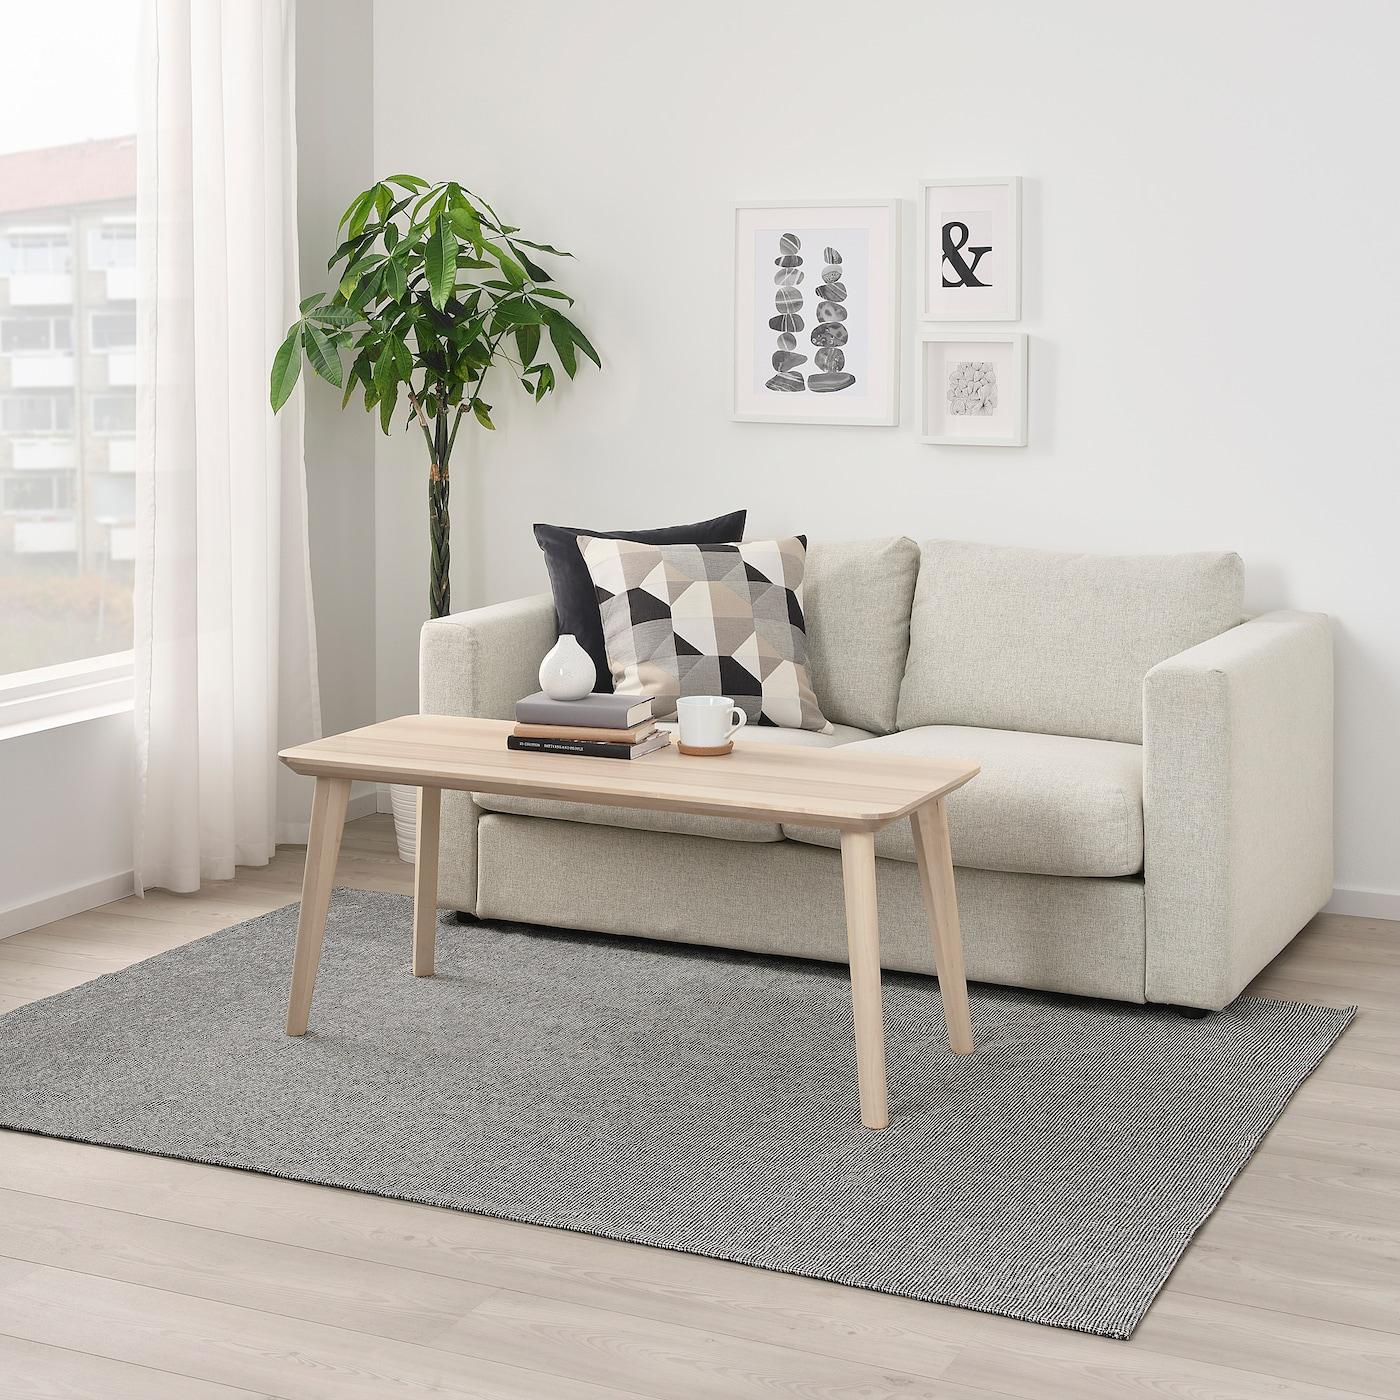 TIPHEDE 提普赫德 平织地毯, 灰色/白色, 155x220 厘米